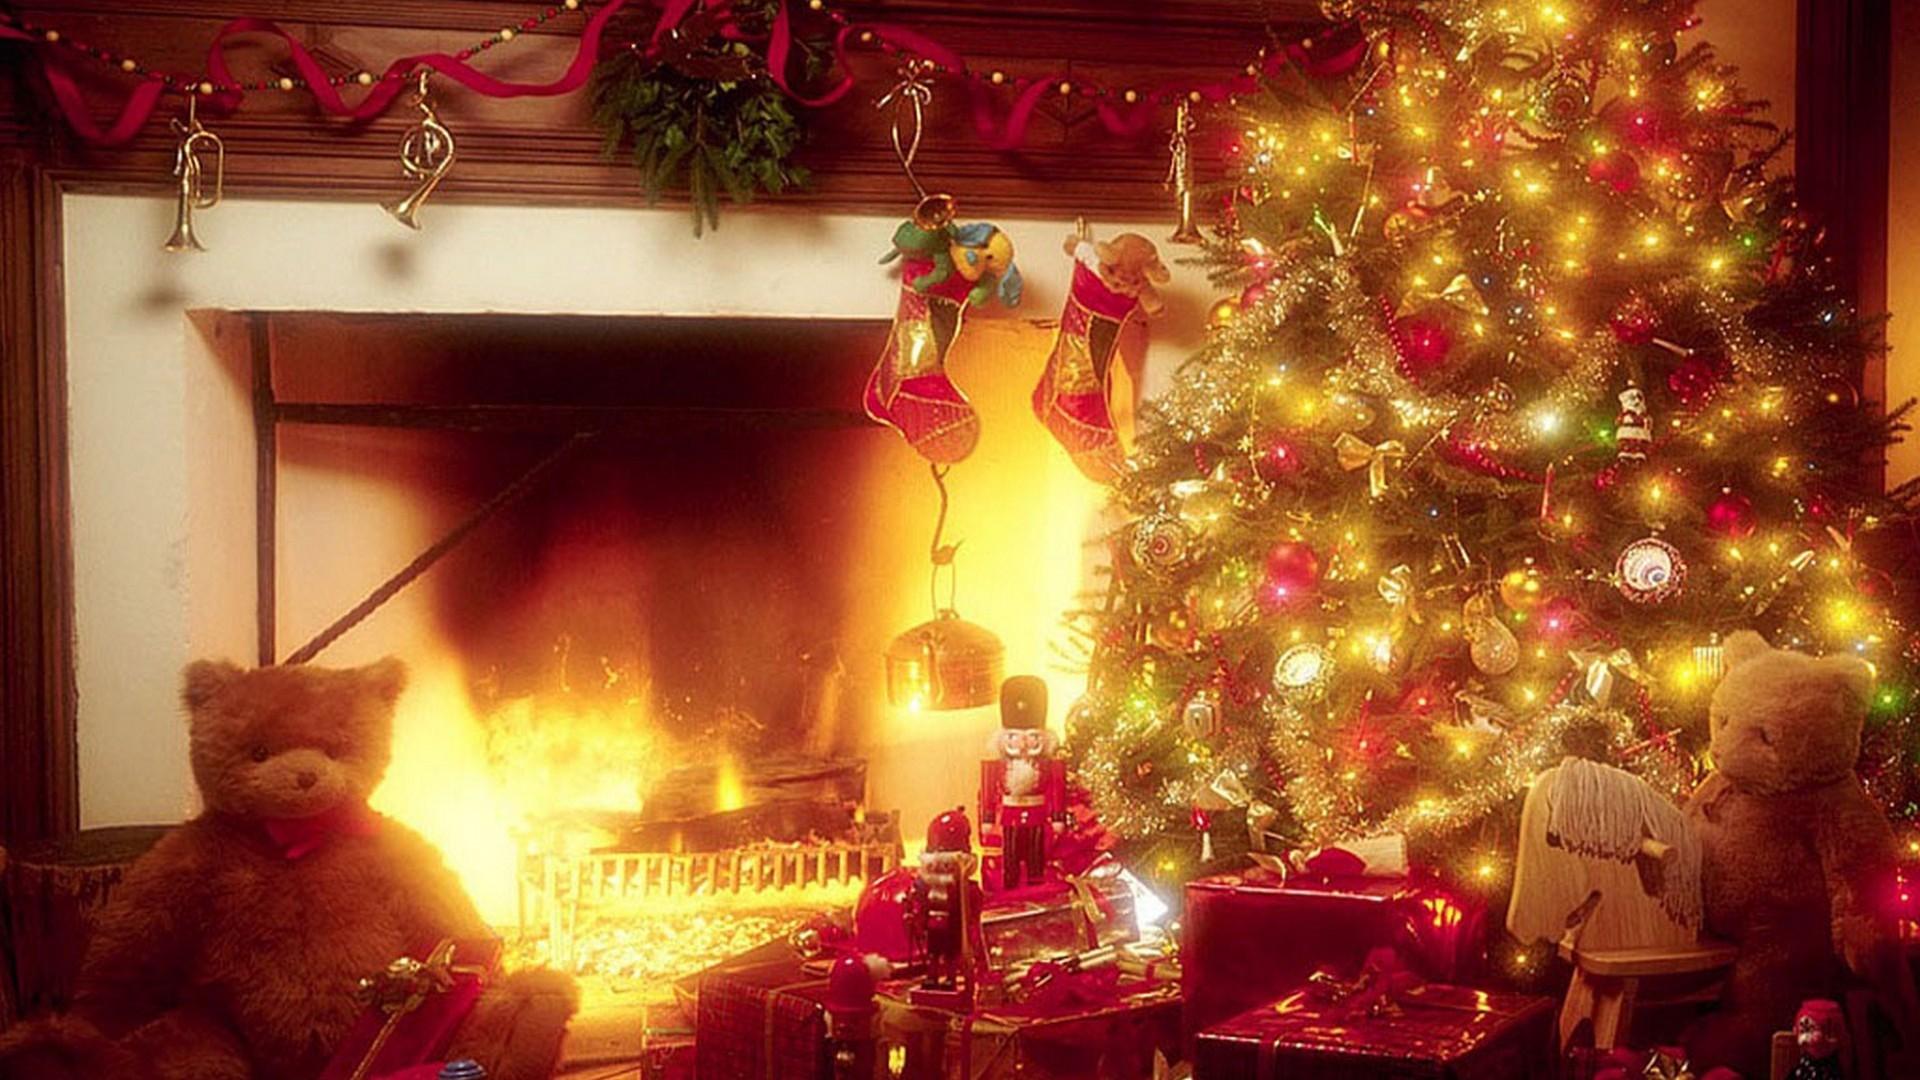 2015 Christmas wallpaper desktop